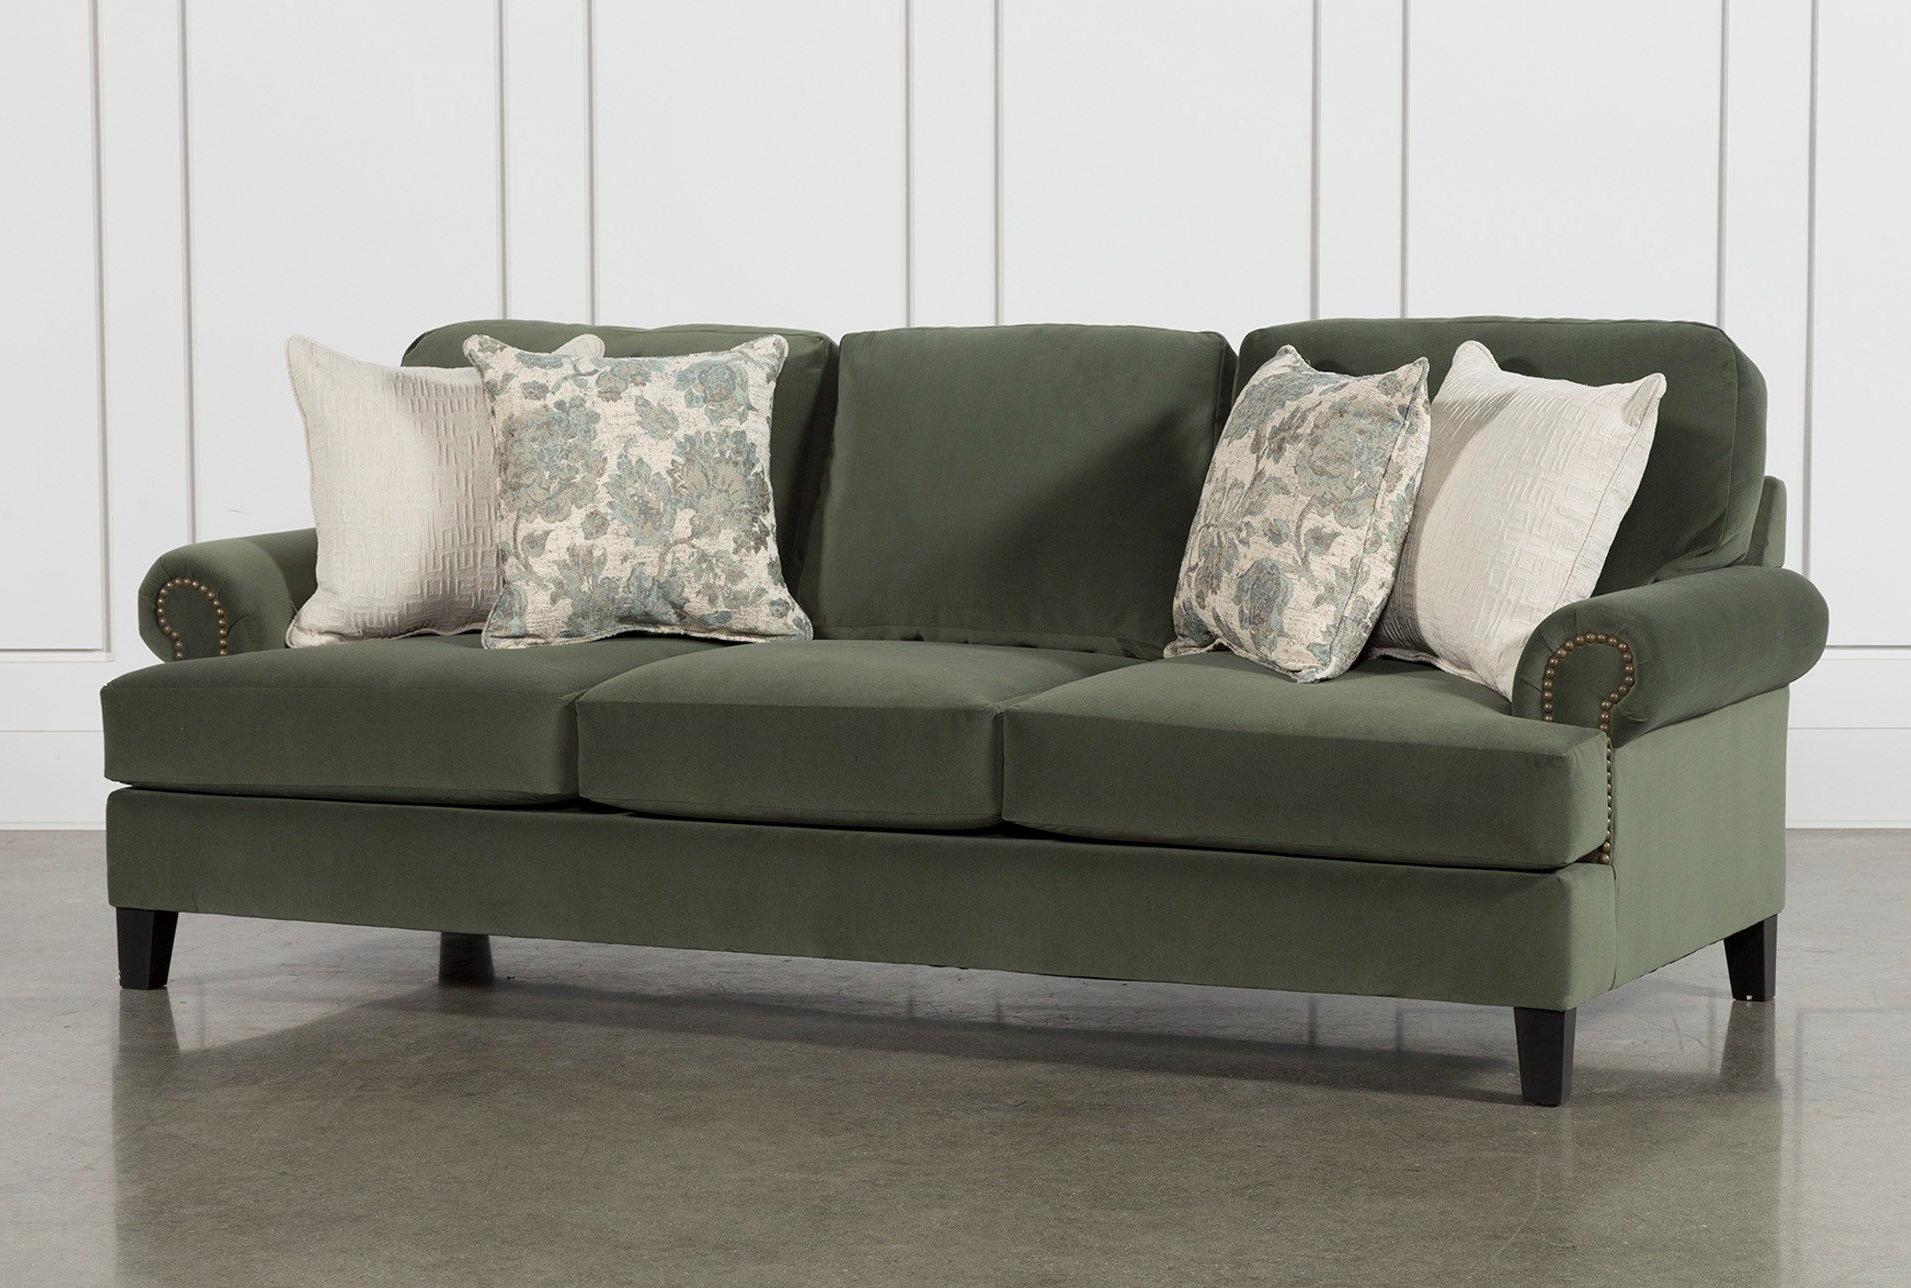 Furniture, Storage, & Lighting (View 2 of 20)